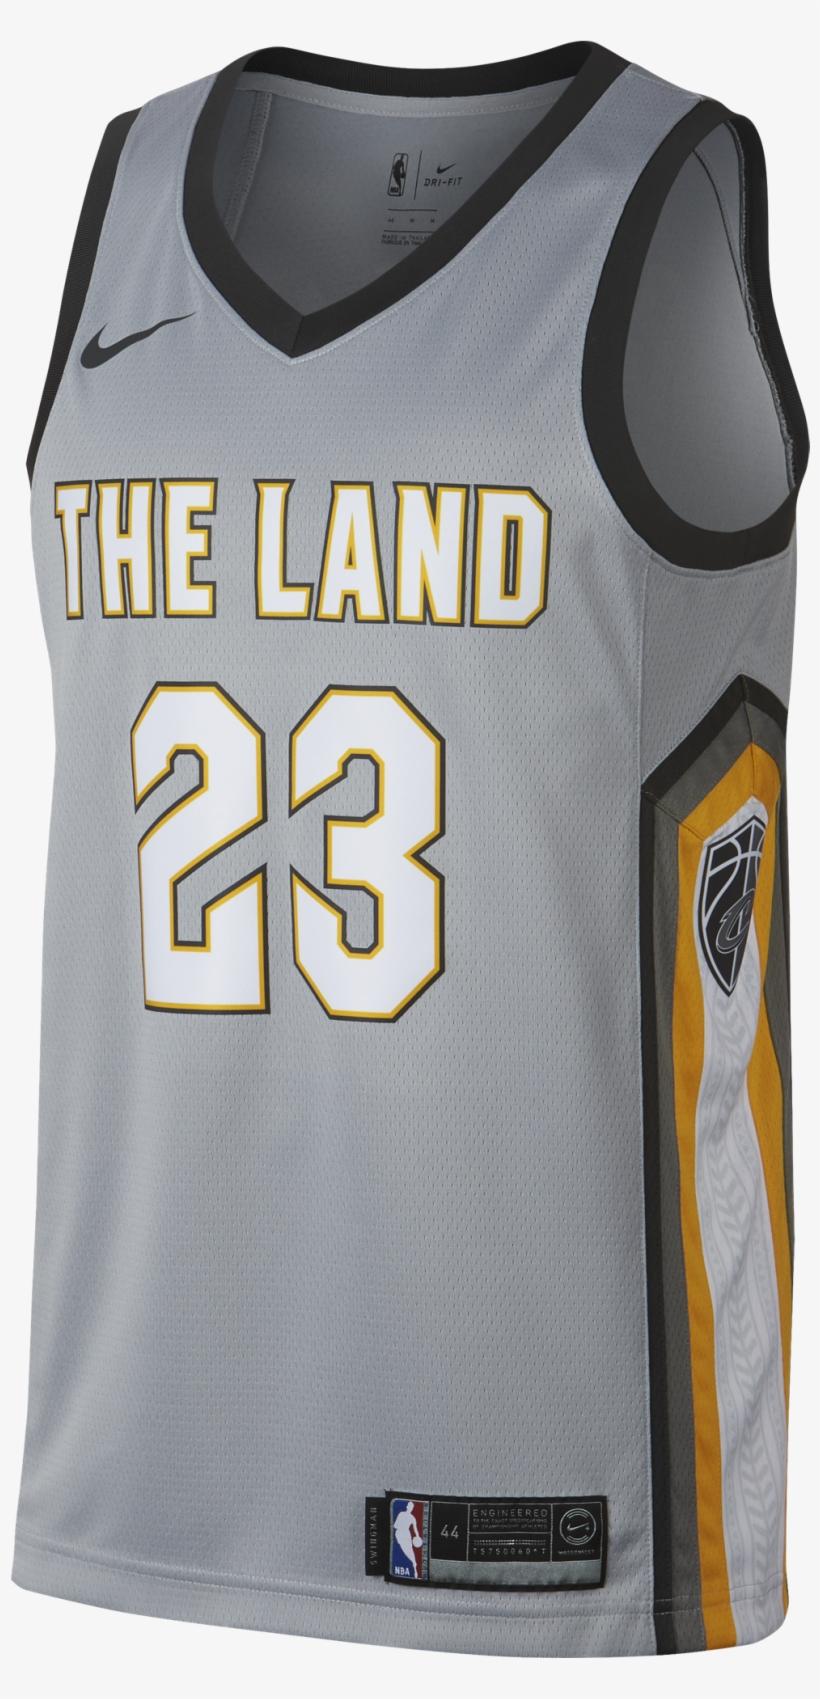 7cc4f932ca0 Nike Nba Lebron James Cleveland Cavaliers City Edition - Jordan Clarkson  Cavs Jersey